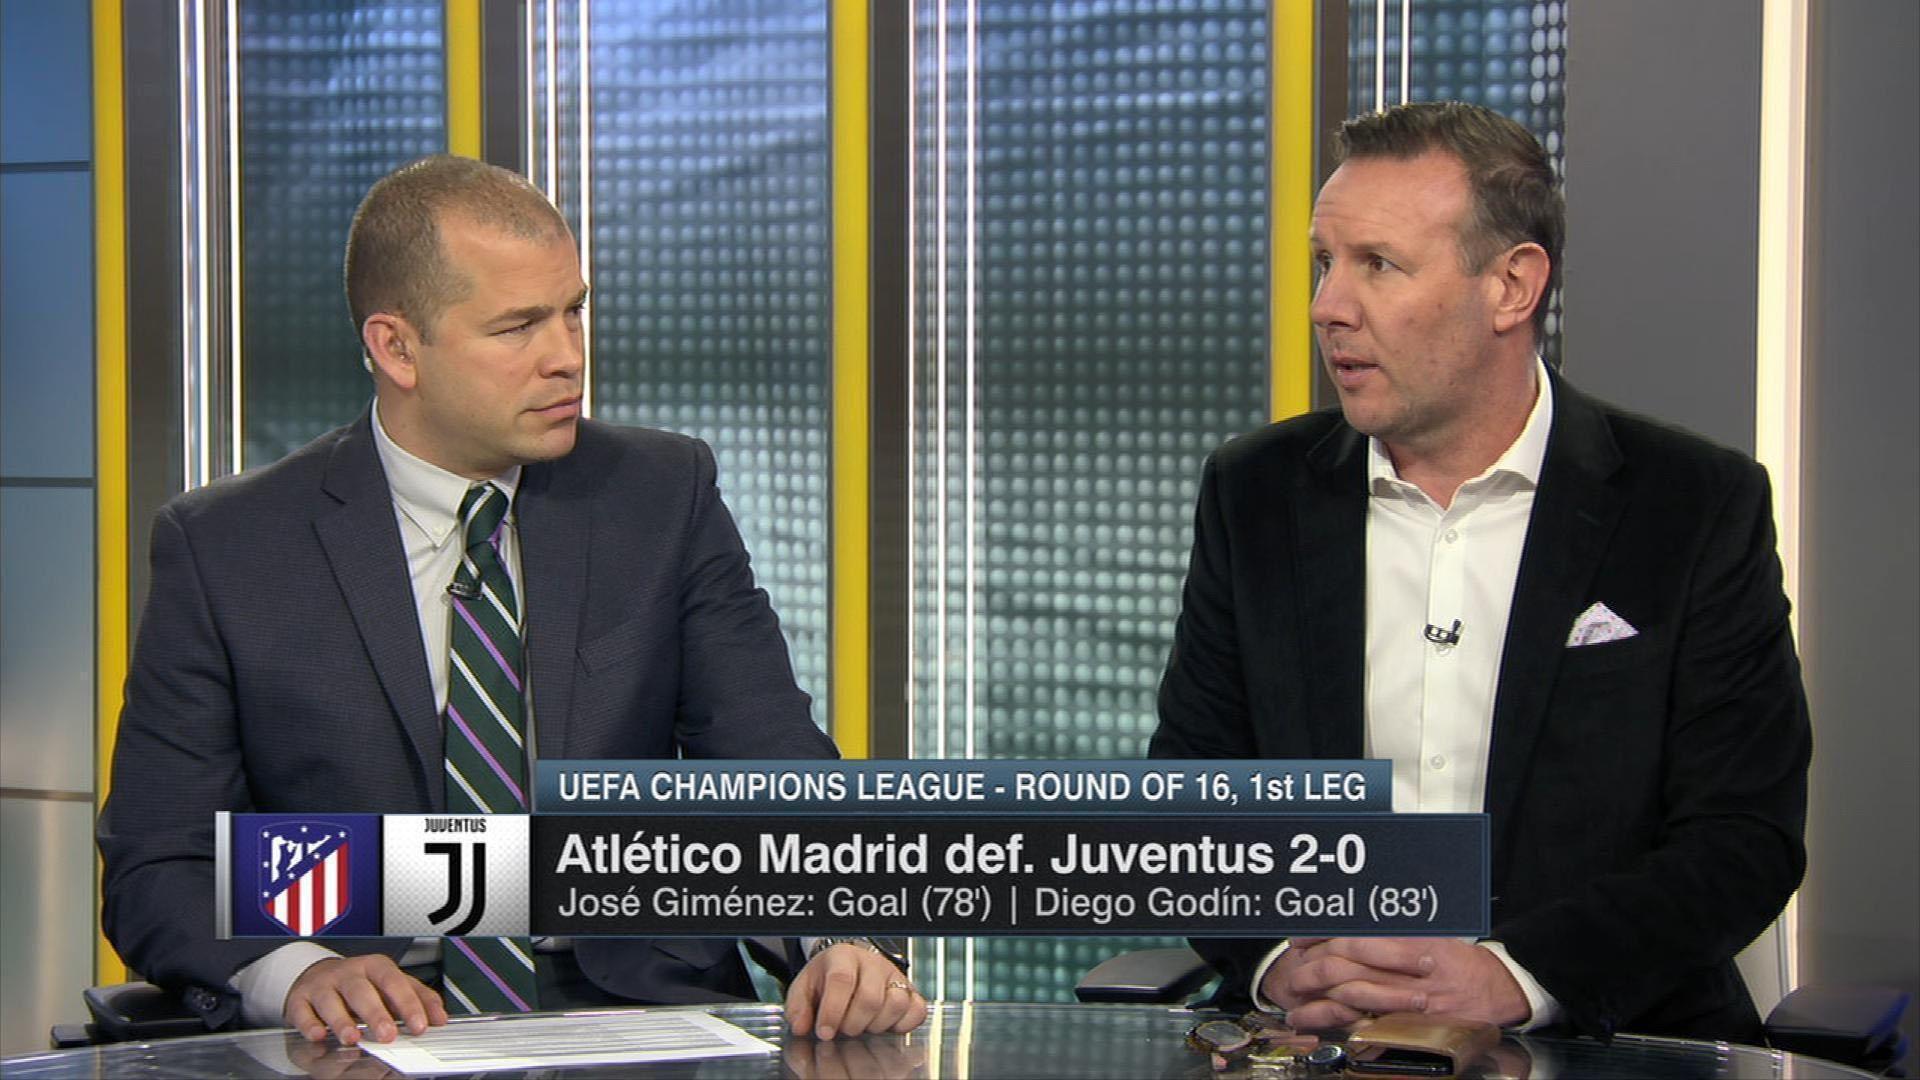 Atletico Madrid's high pressure 'rattled' Juventus